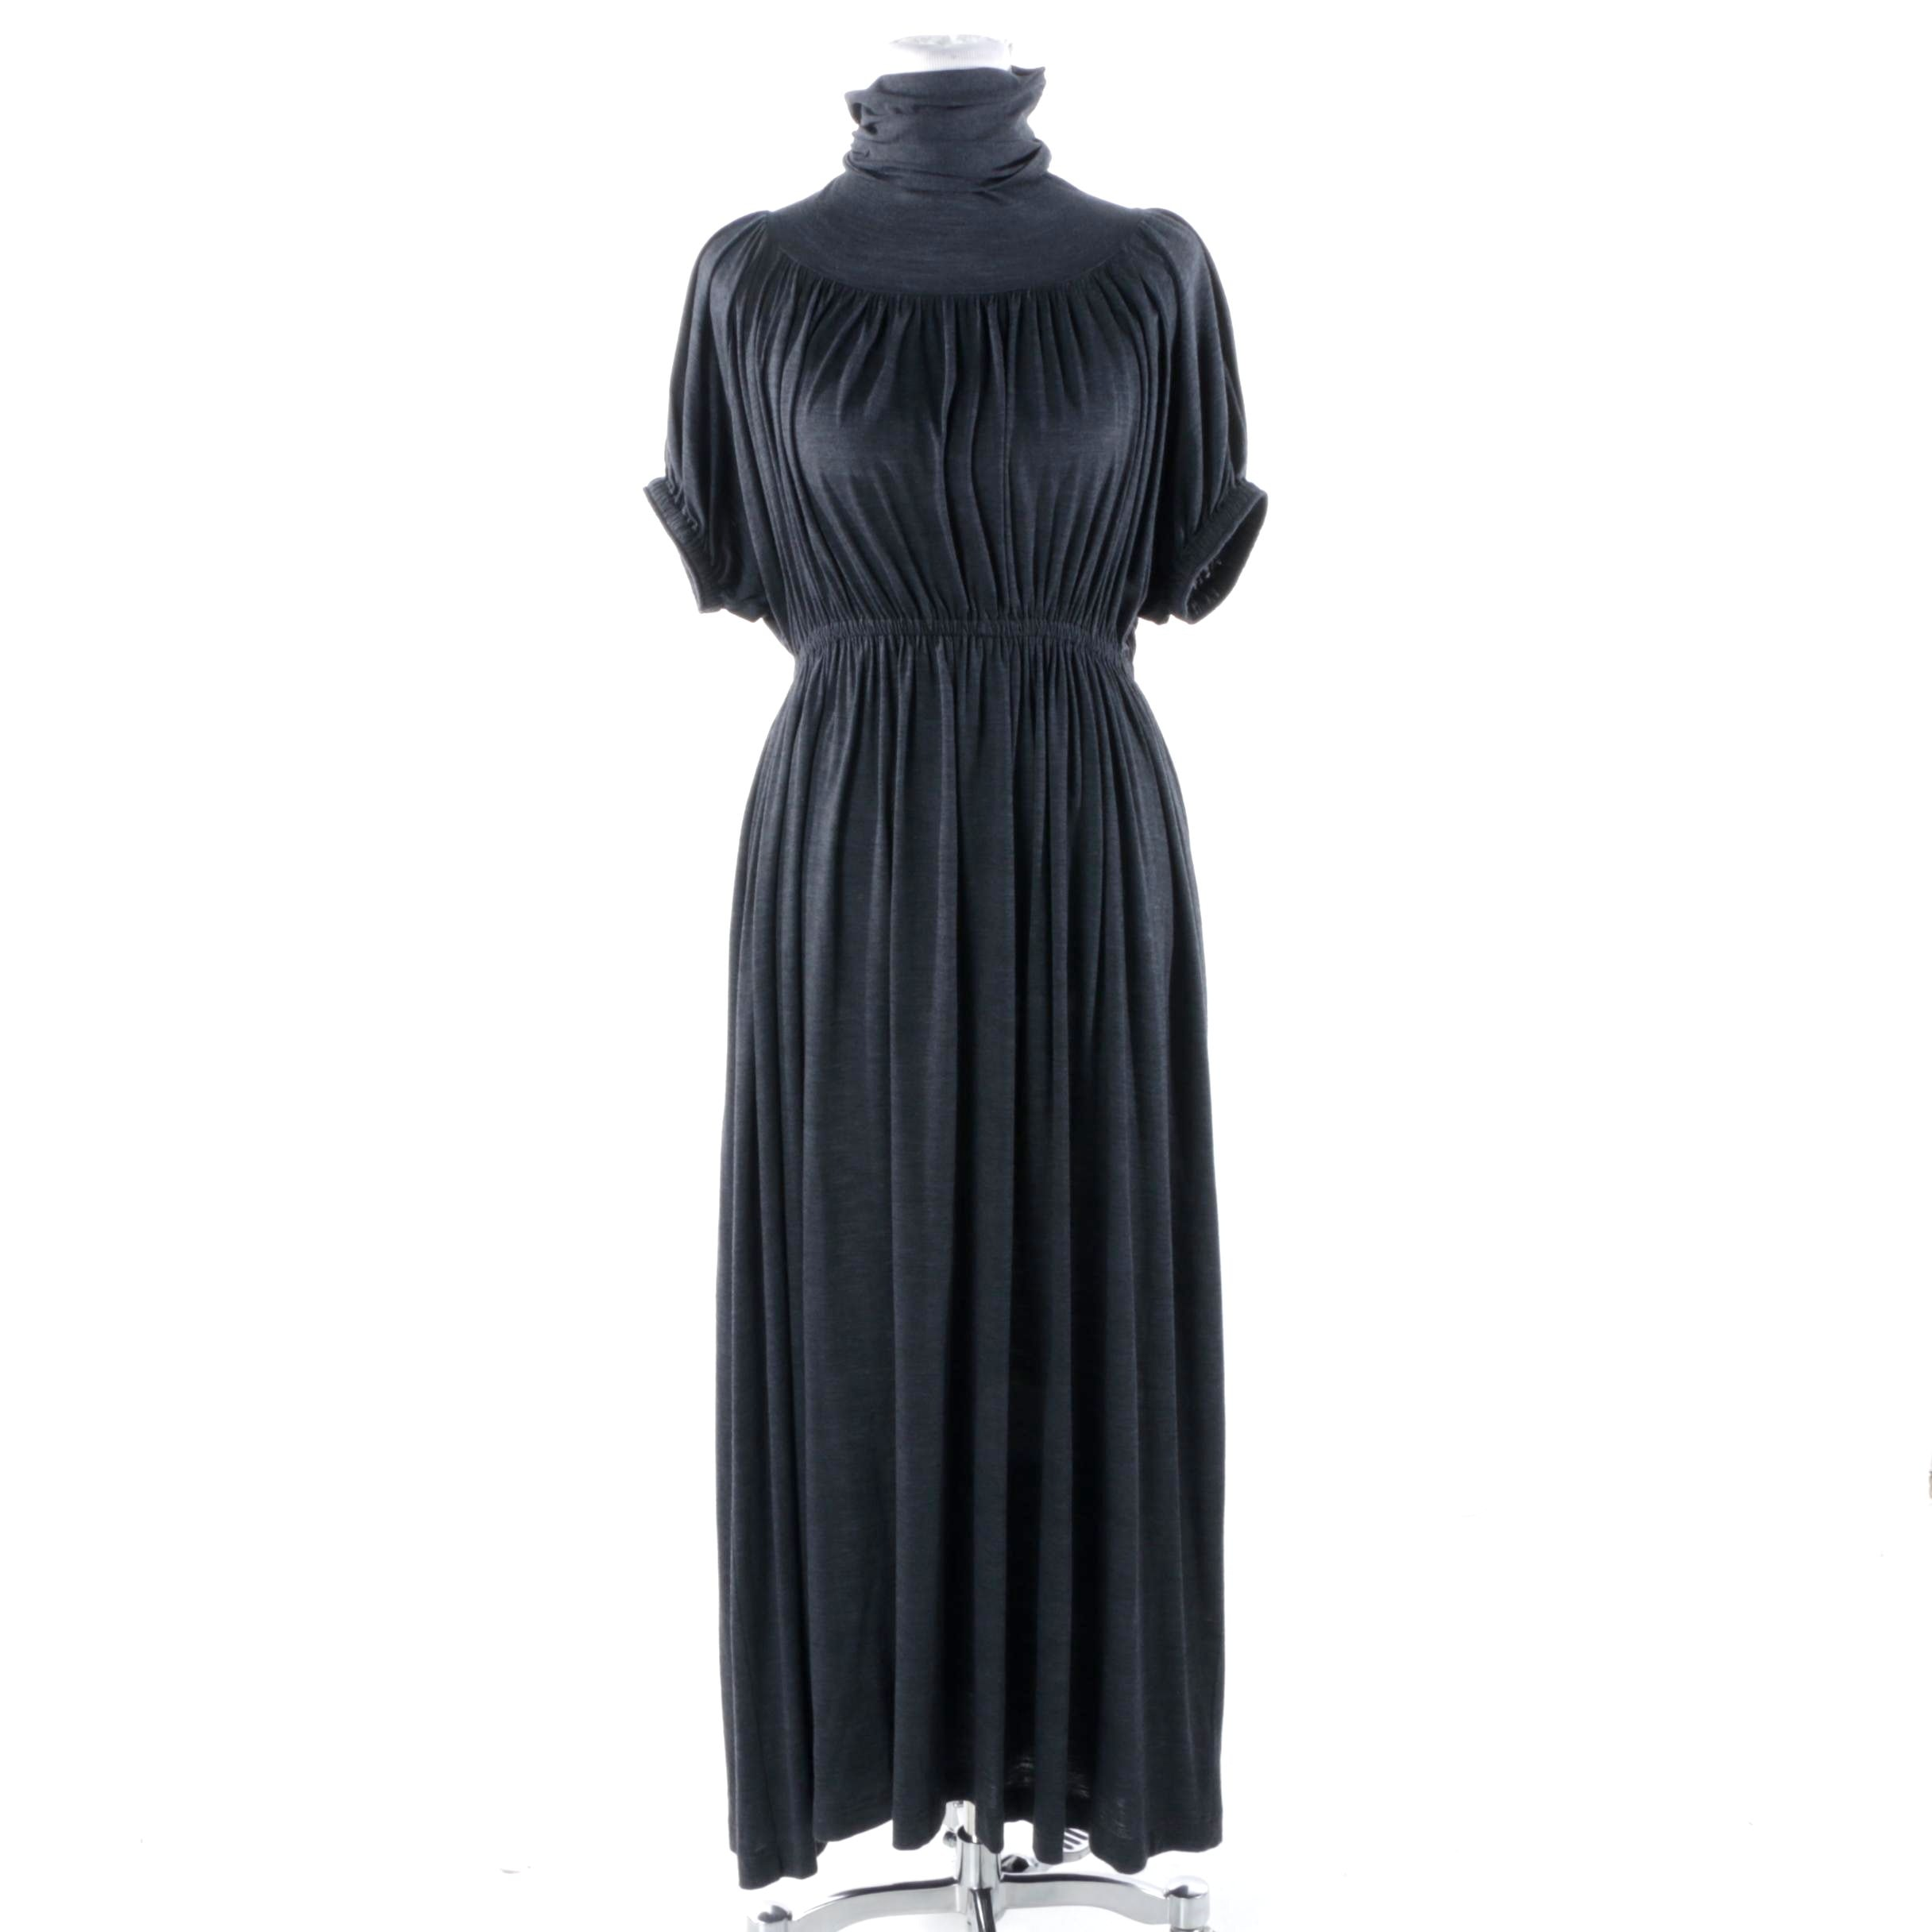 Jean Paul Gaultier Classique Charcoal Gray Gathered Turtleneck Dress